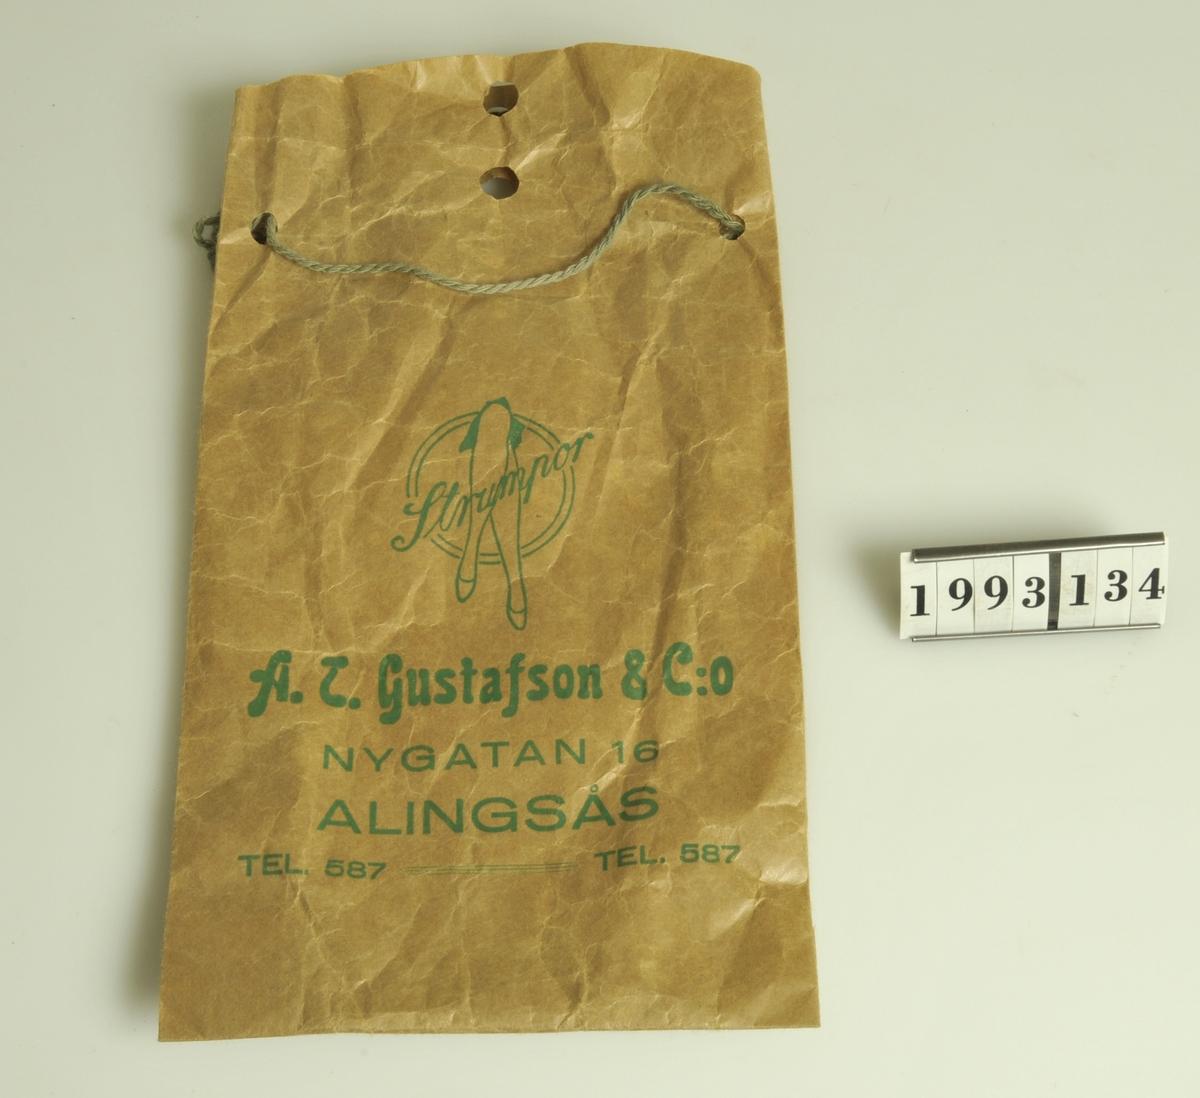 Grön. Grön text: Strumpor A.T. Gustafsson & Co Nygatan 16  Alingsås